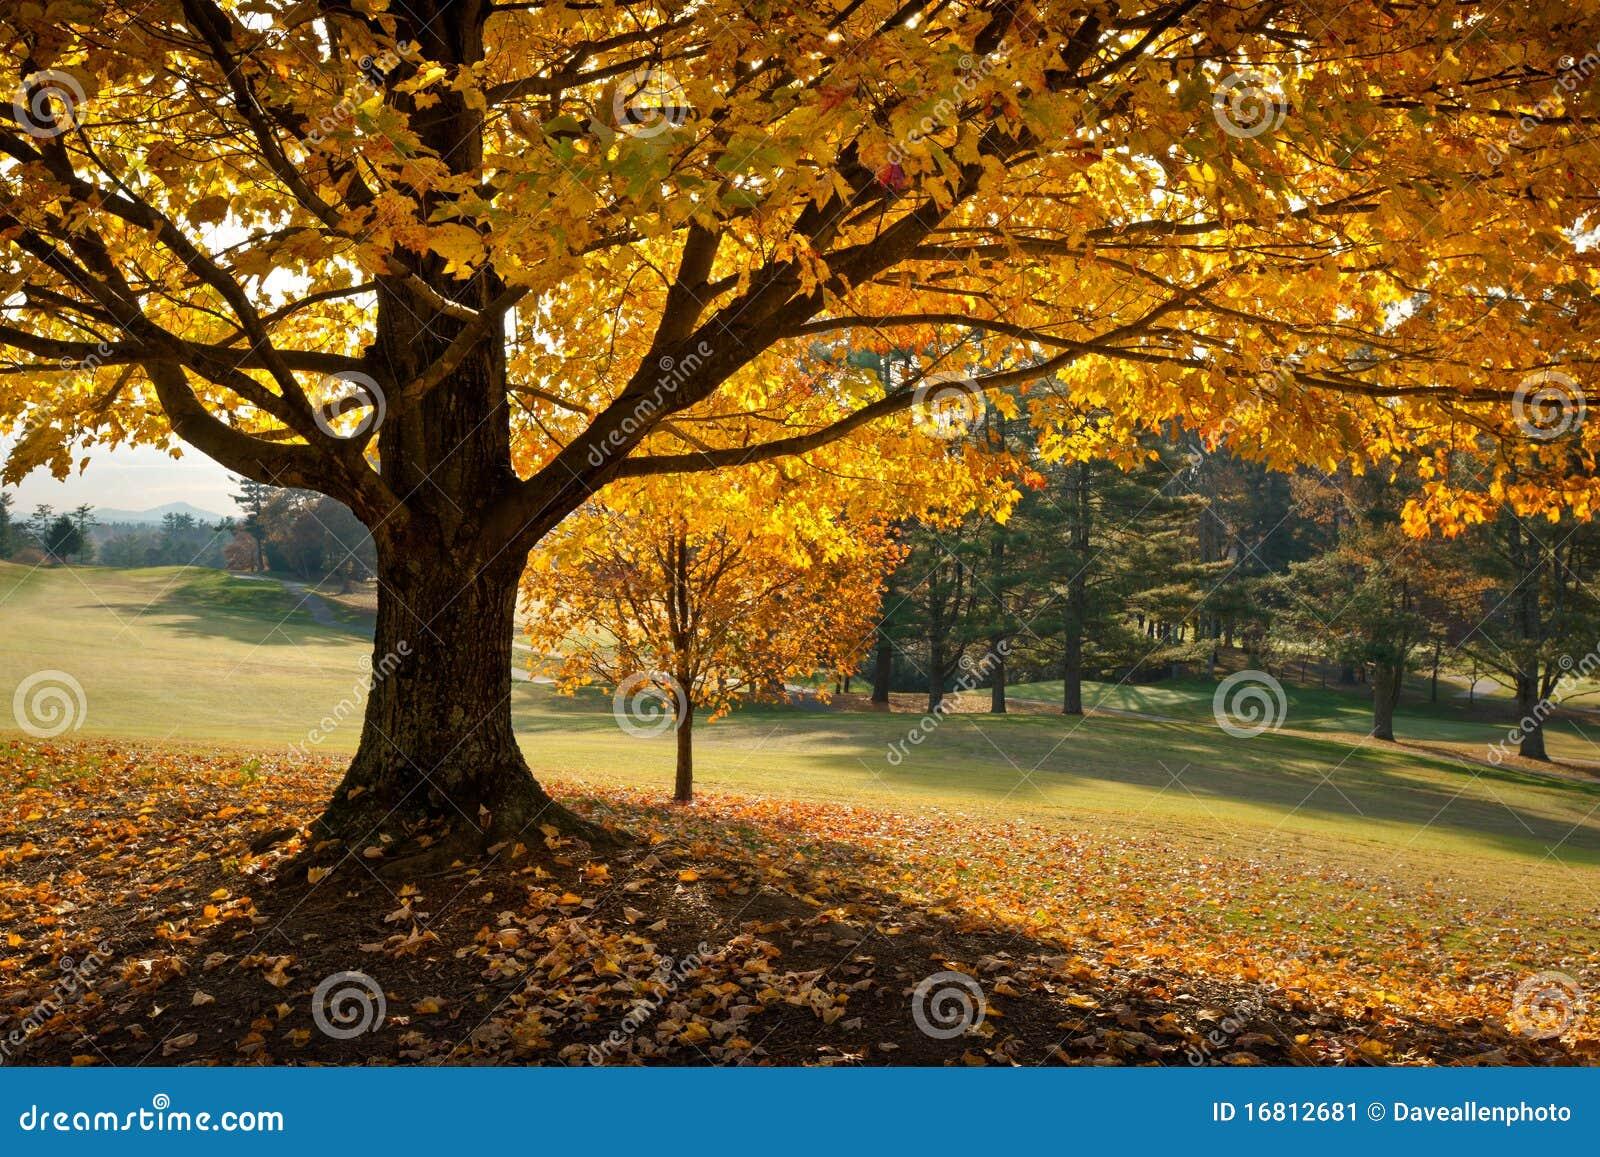 Goldener Fall-Laub-Herbst-Gelb-Ahornholz-Baum